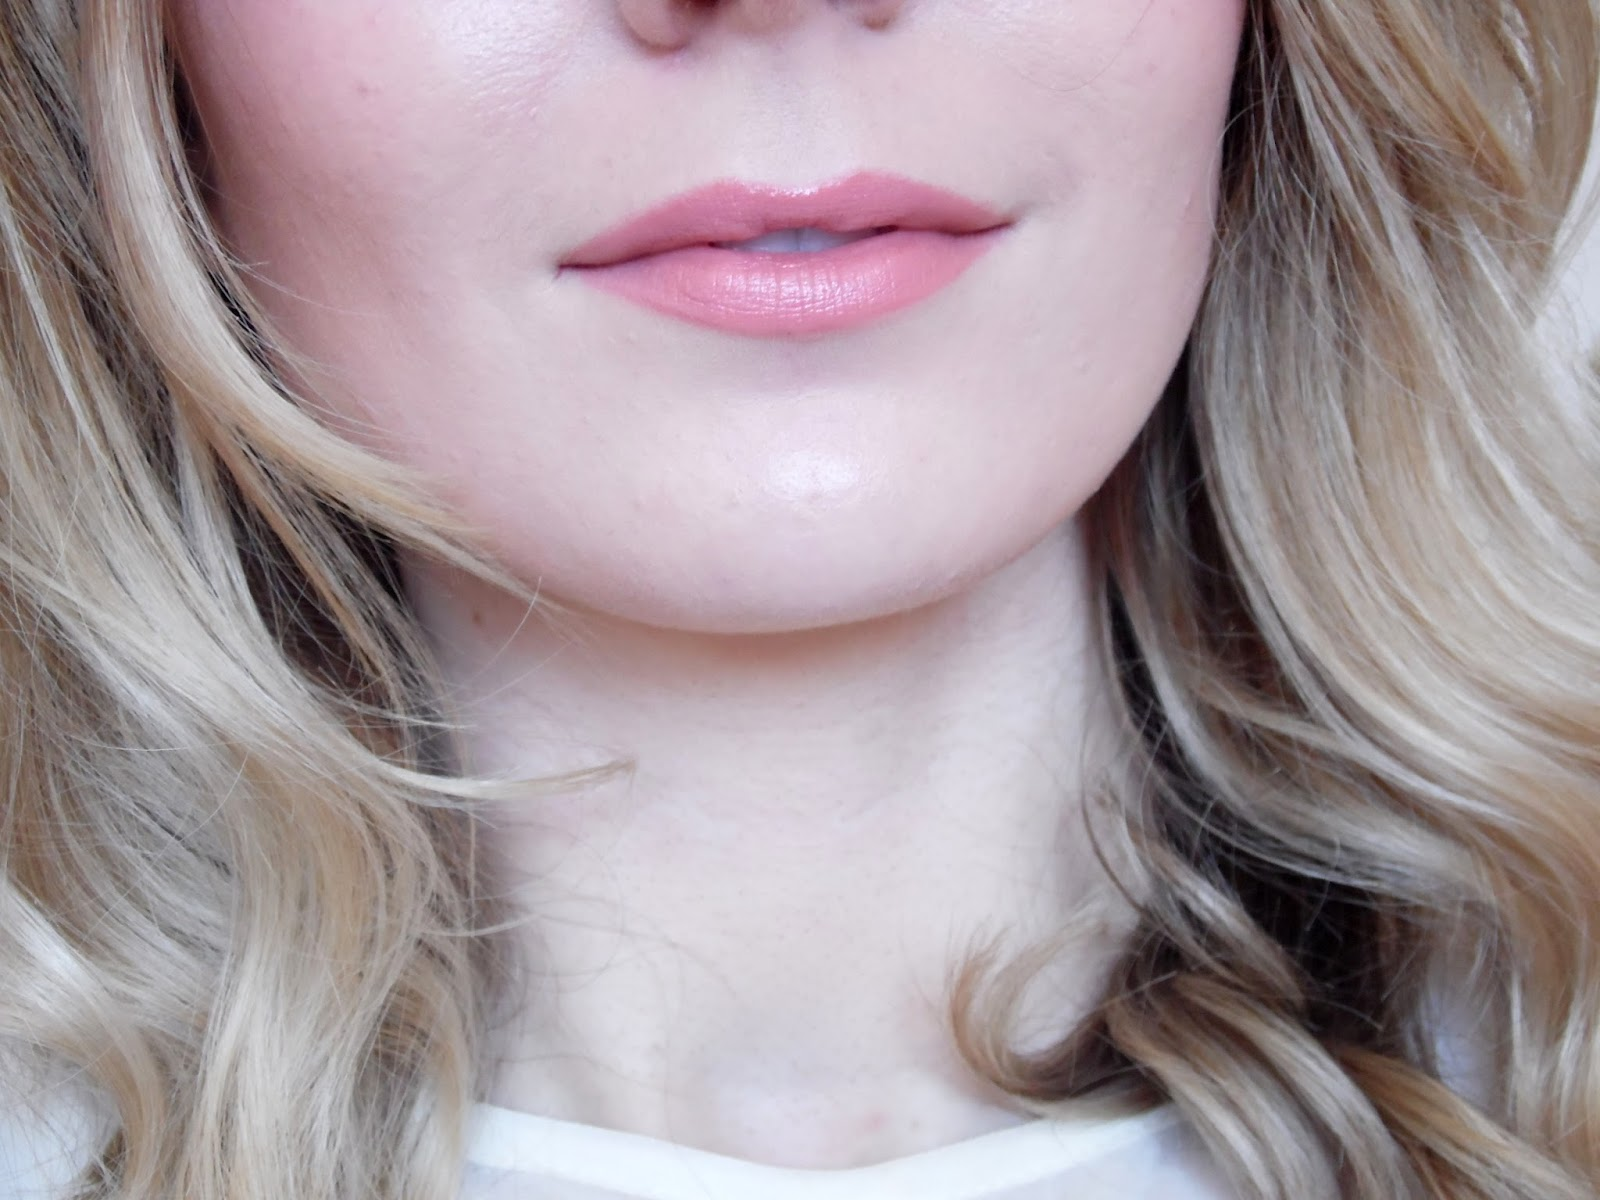 bitch perfect lipstick worn